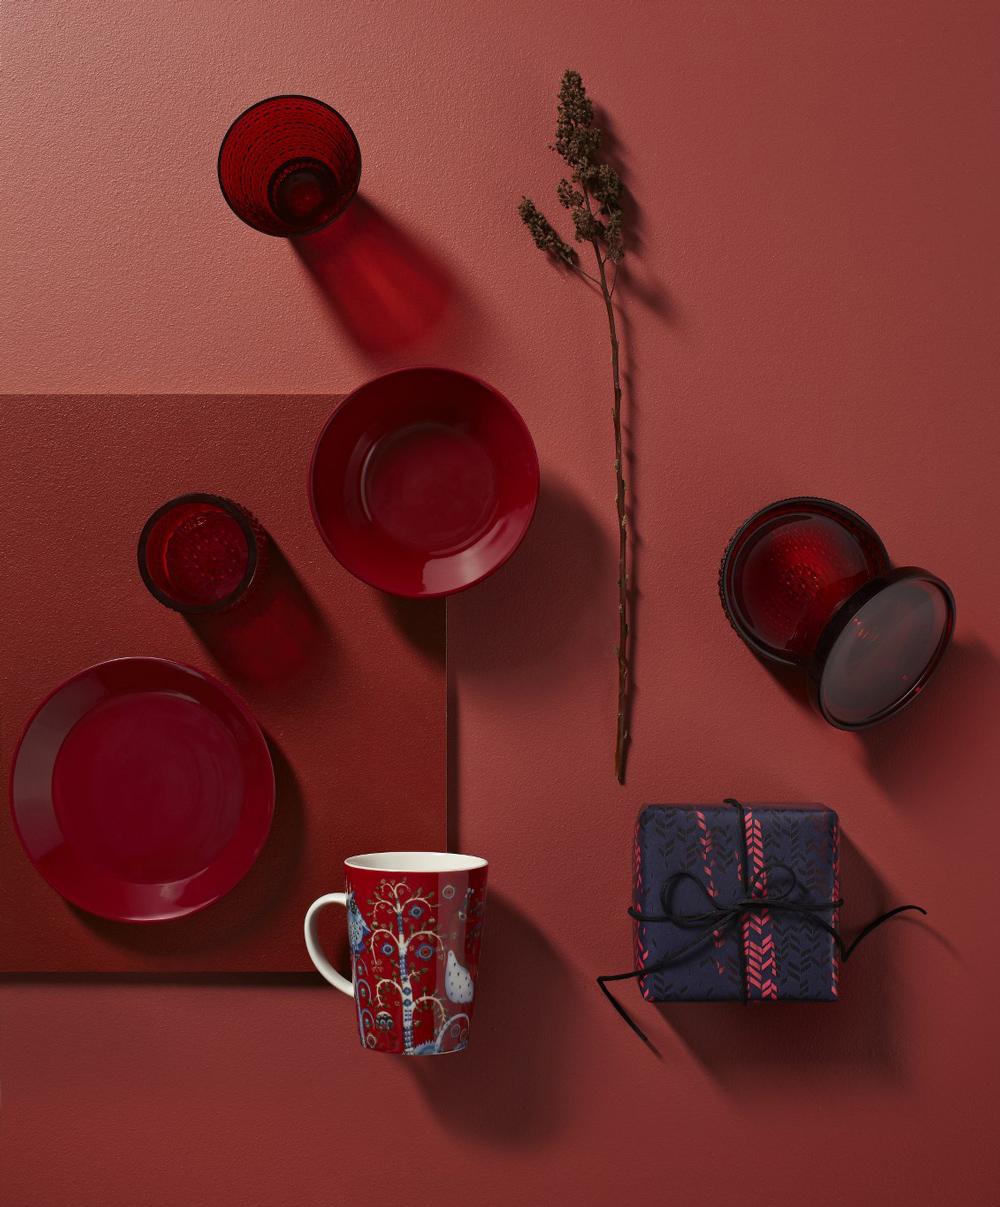 Iittala-Xmas--2016-gifting-red-3_JPG